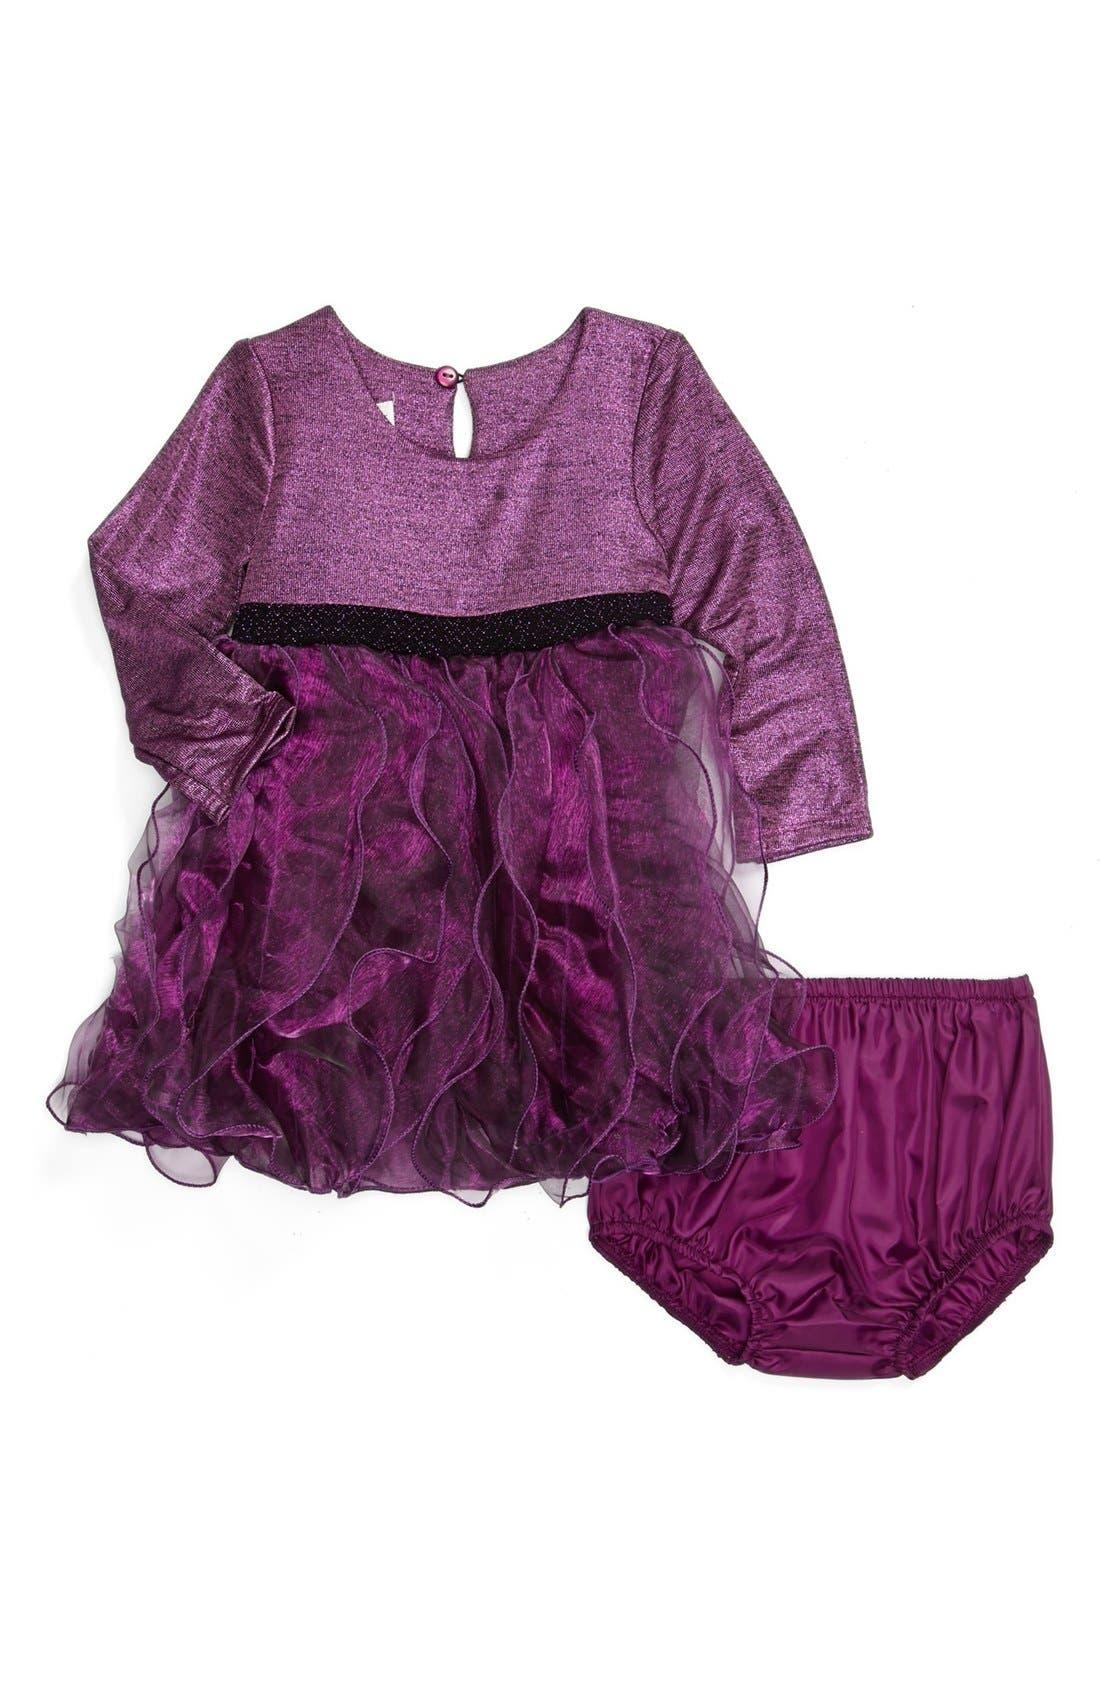 Alternate Image 1 Selected - Iris & Ivy Foil Knit Long Sleeve Dress (Baby Girls)